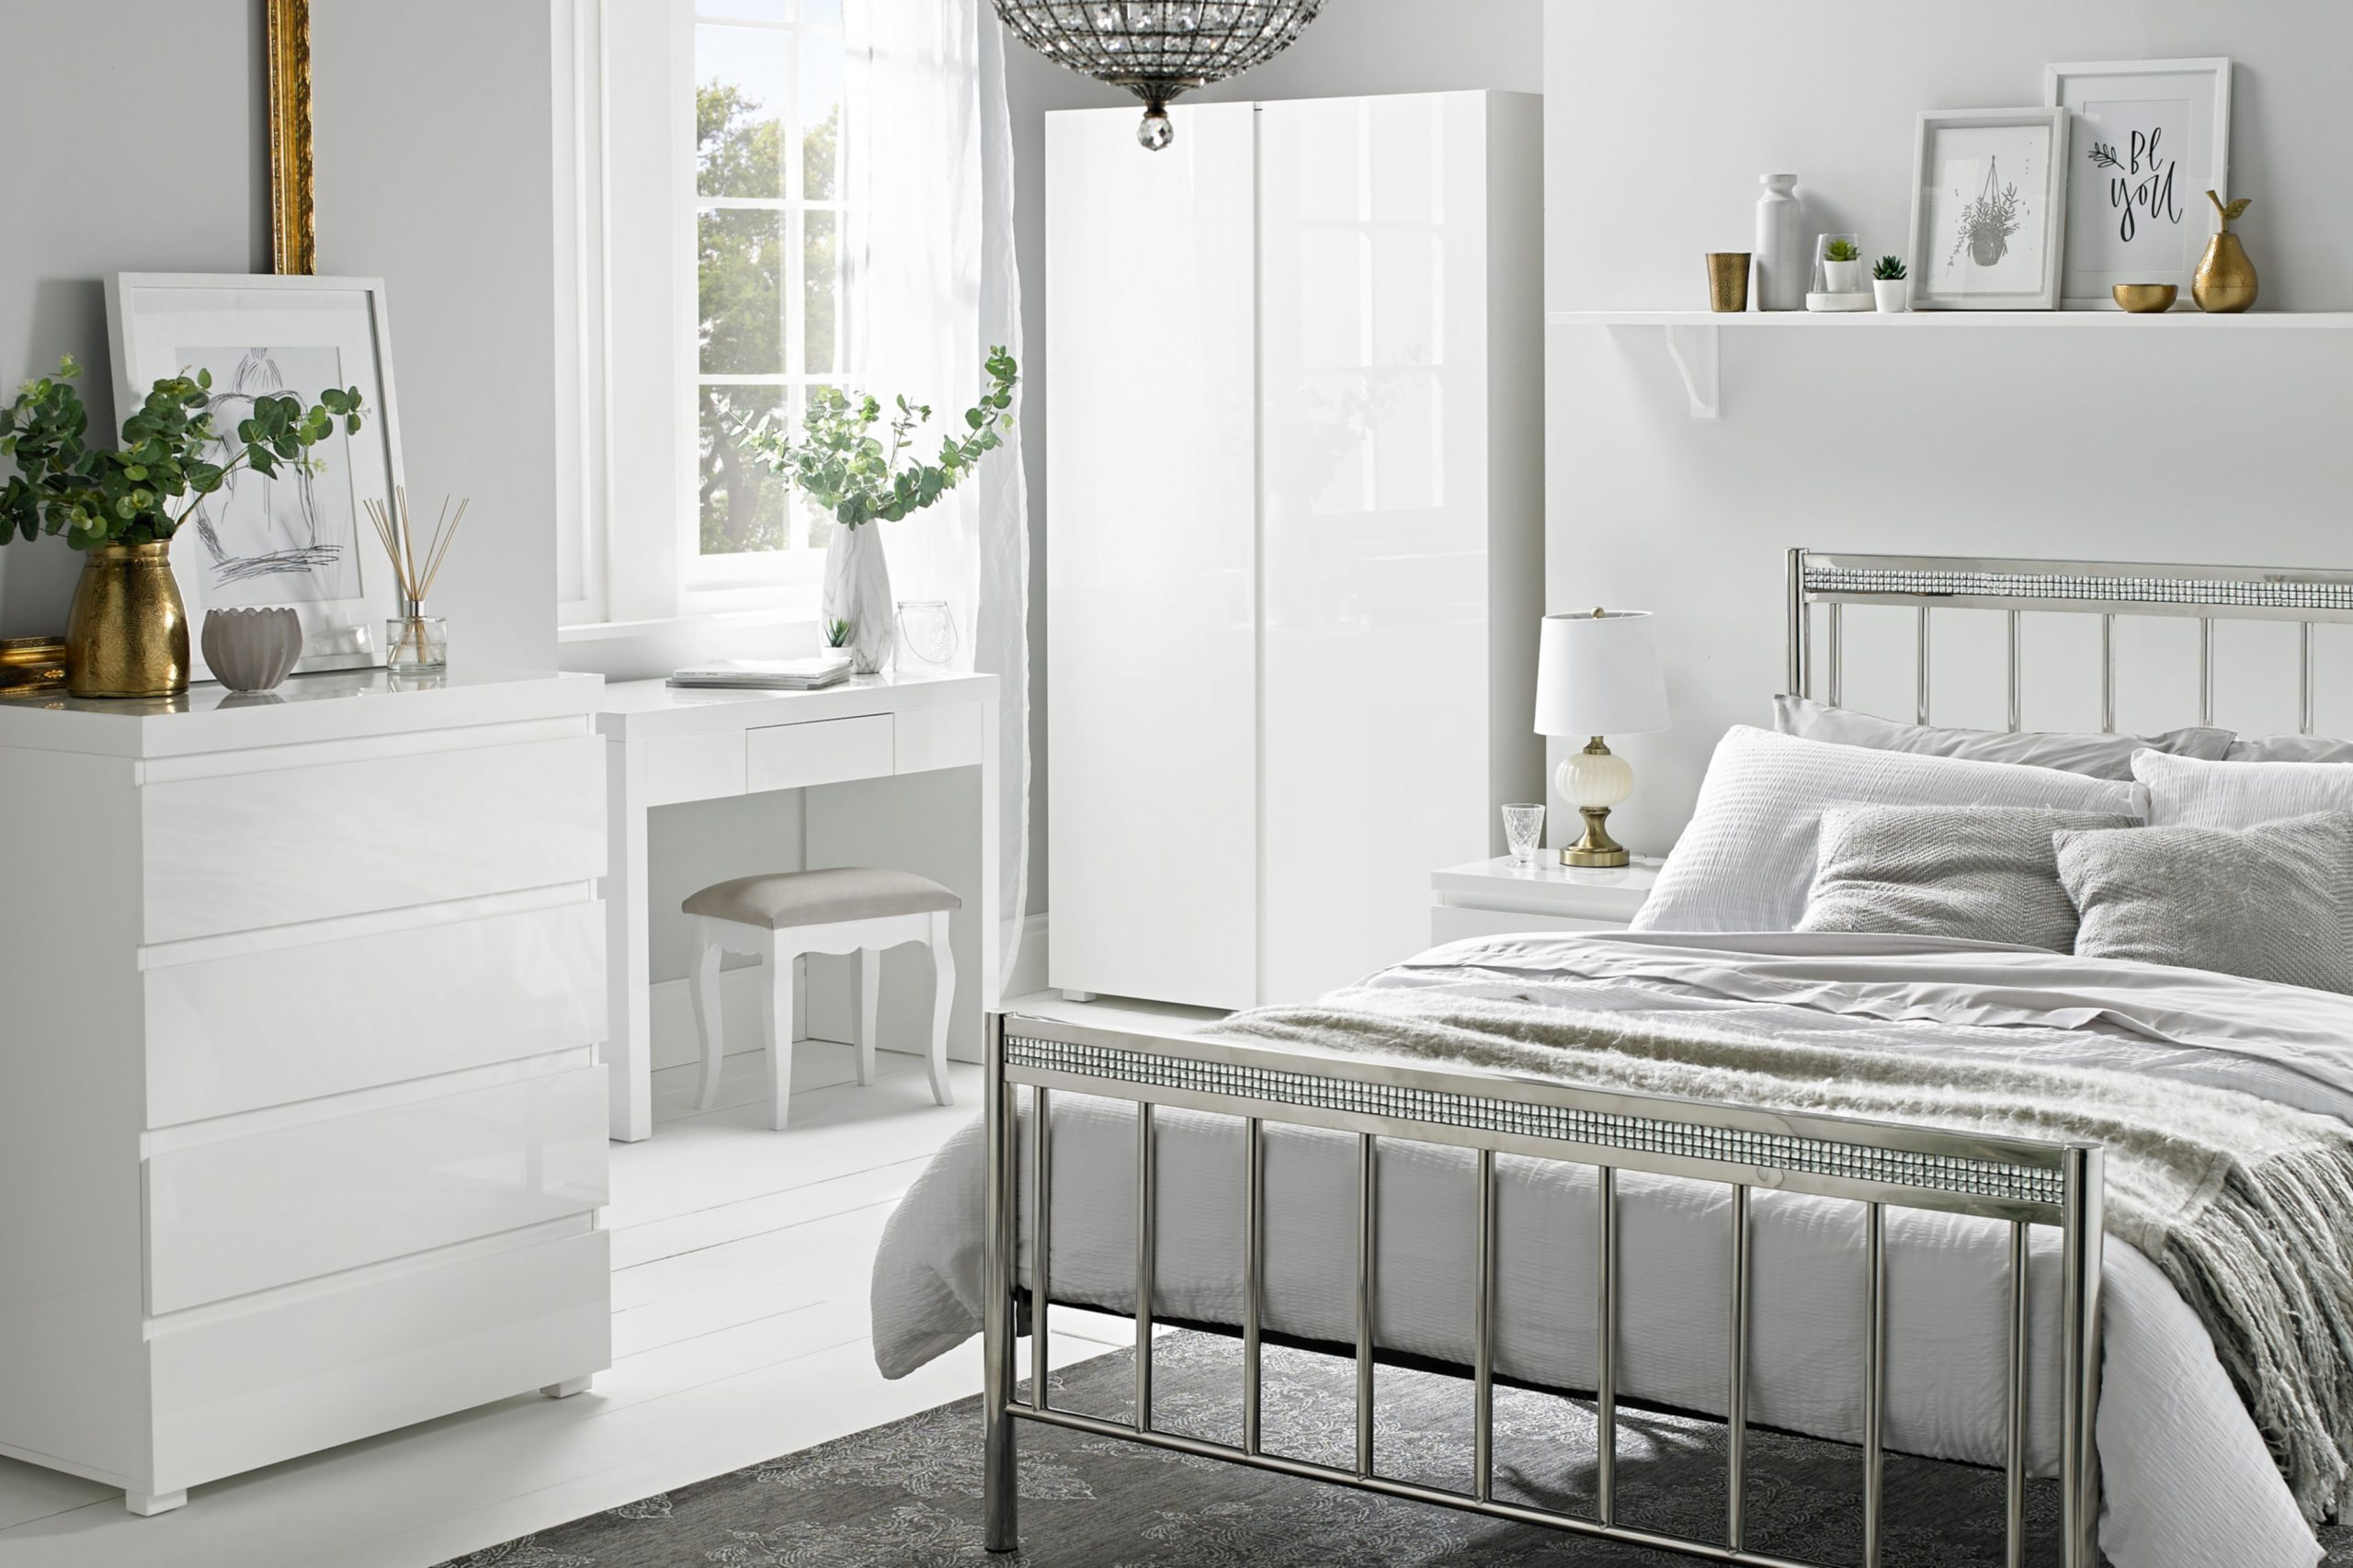 9 Bedroom Ideas To Help You Sleep Better In 9  Home Store Living - Bedroom Ideas Uk 2020